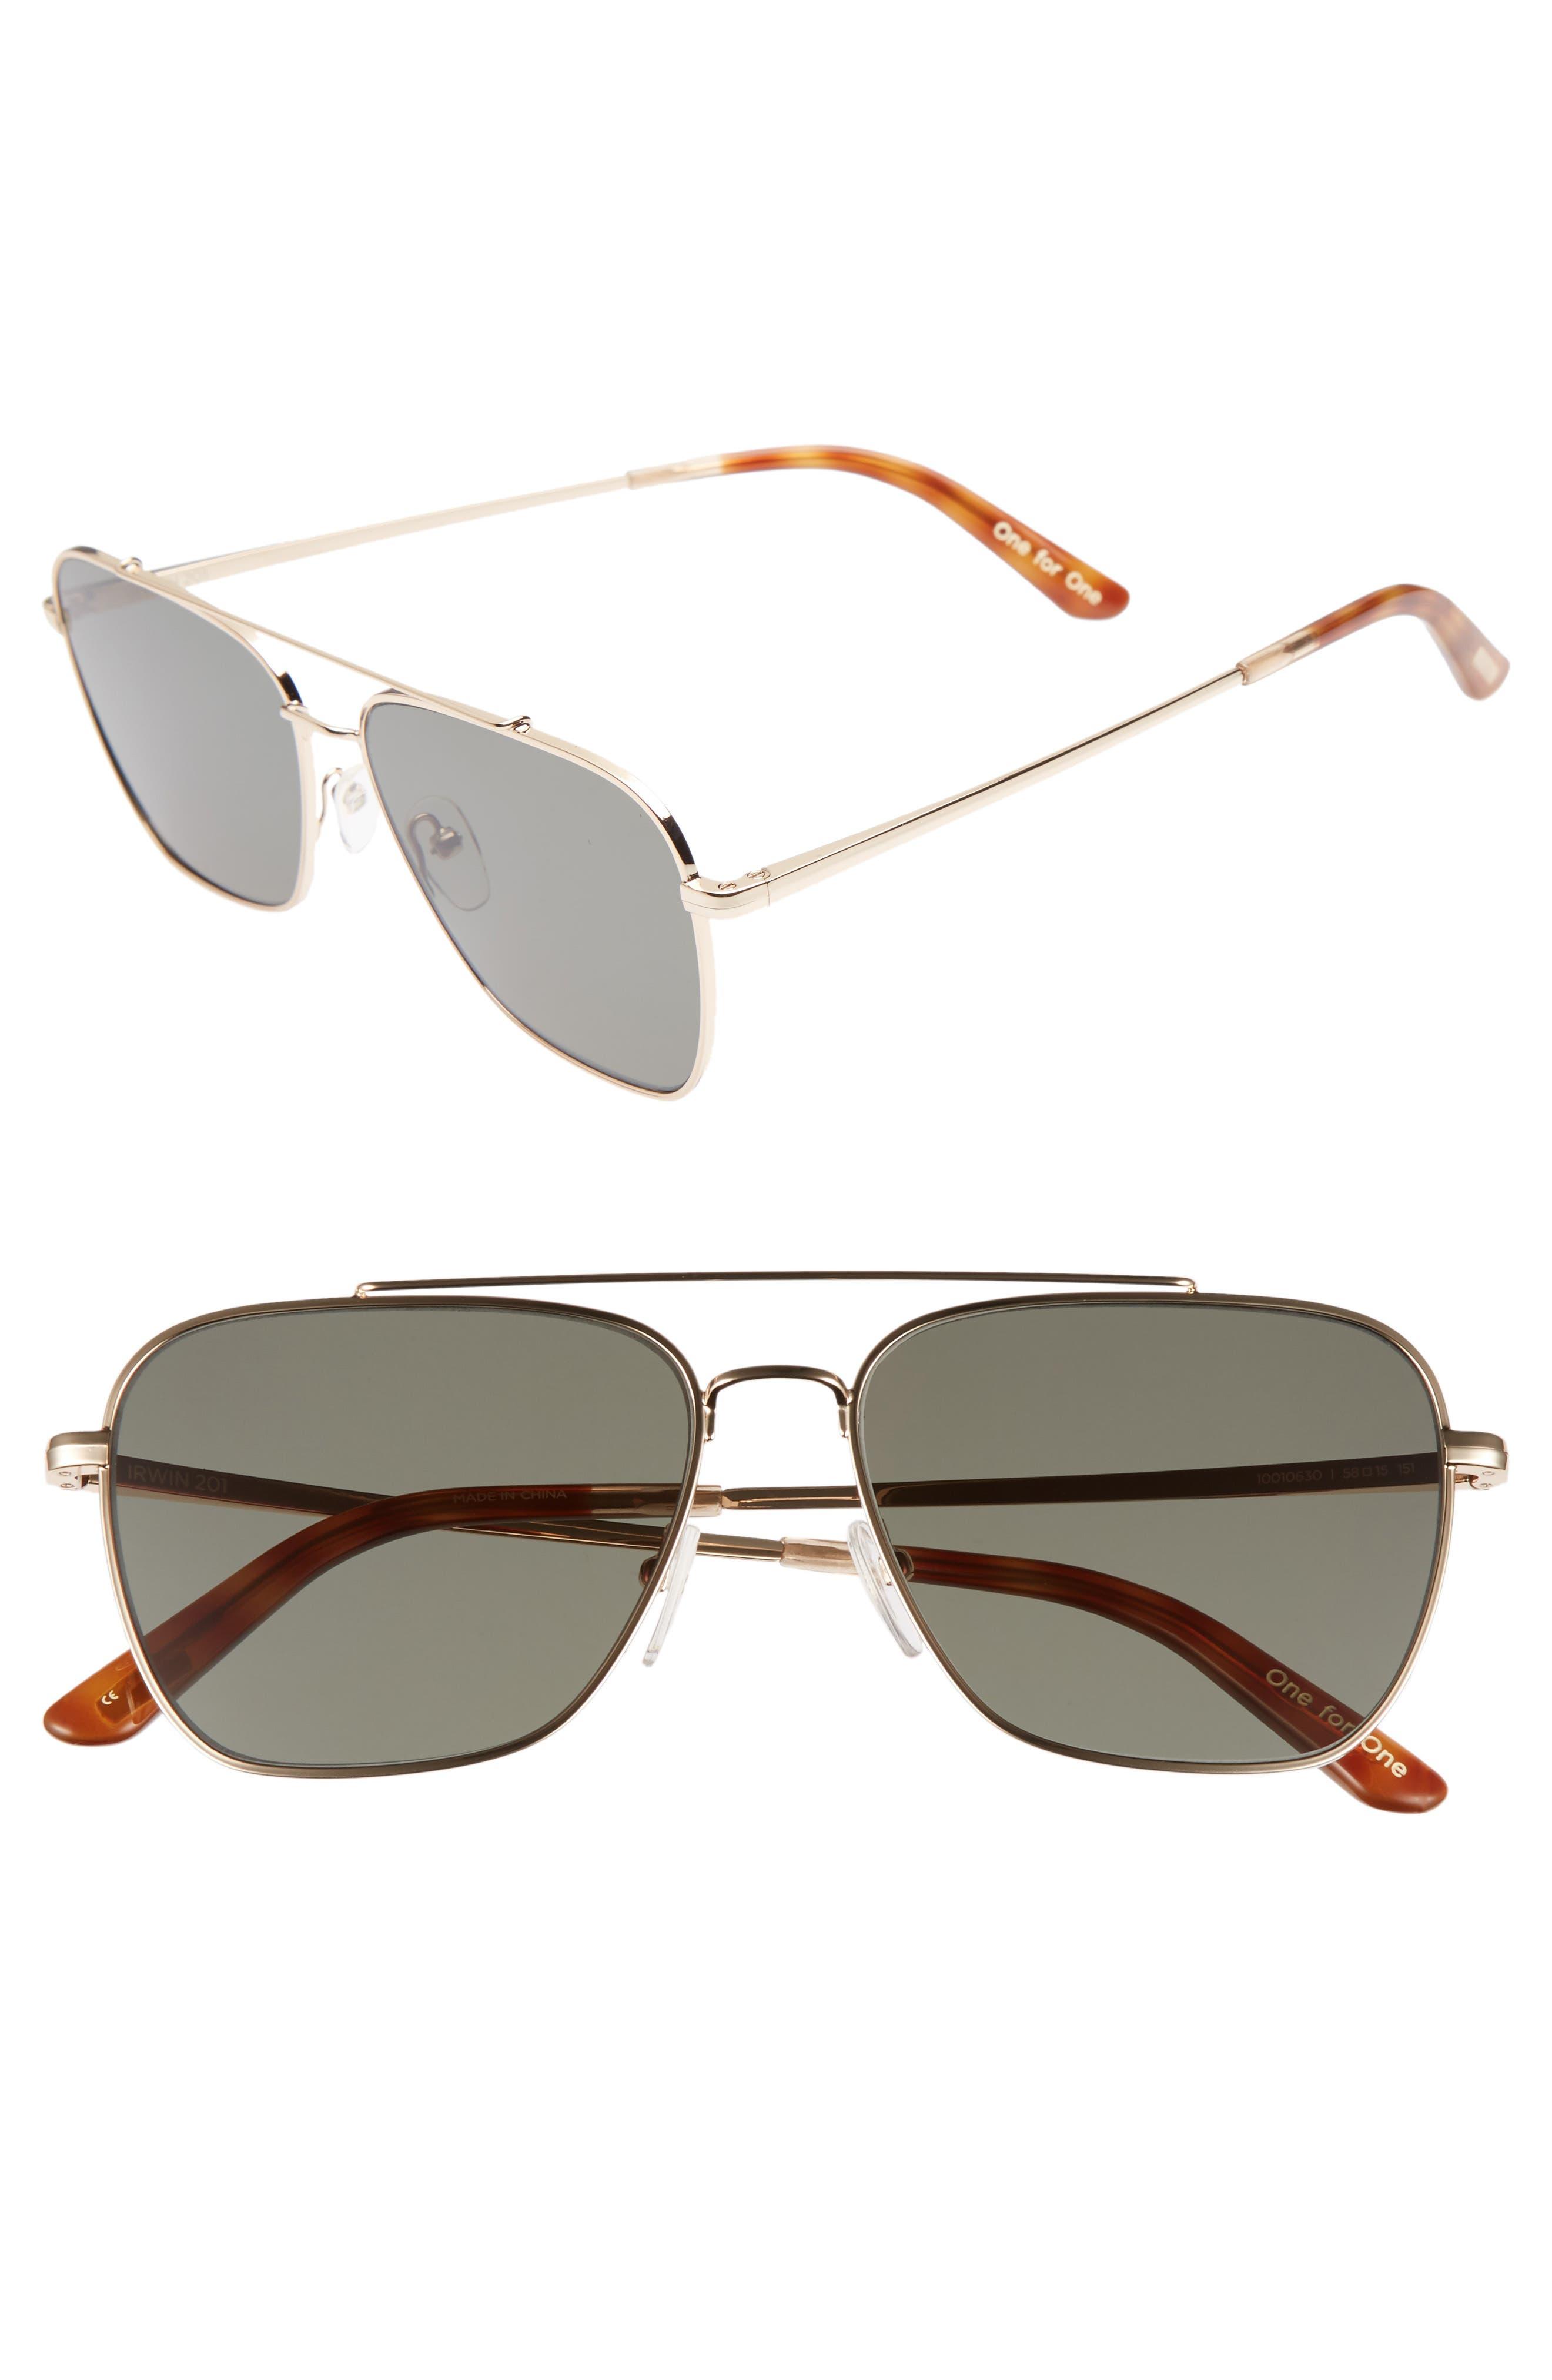 Irwin 58mm Sunglasses,                             Main thumbnail 1, color,                             Shiny Gold